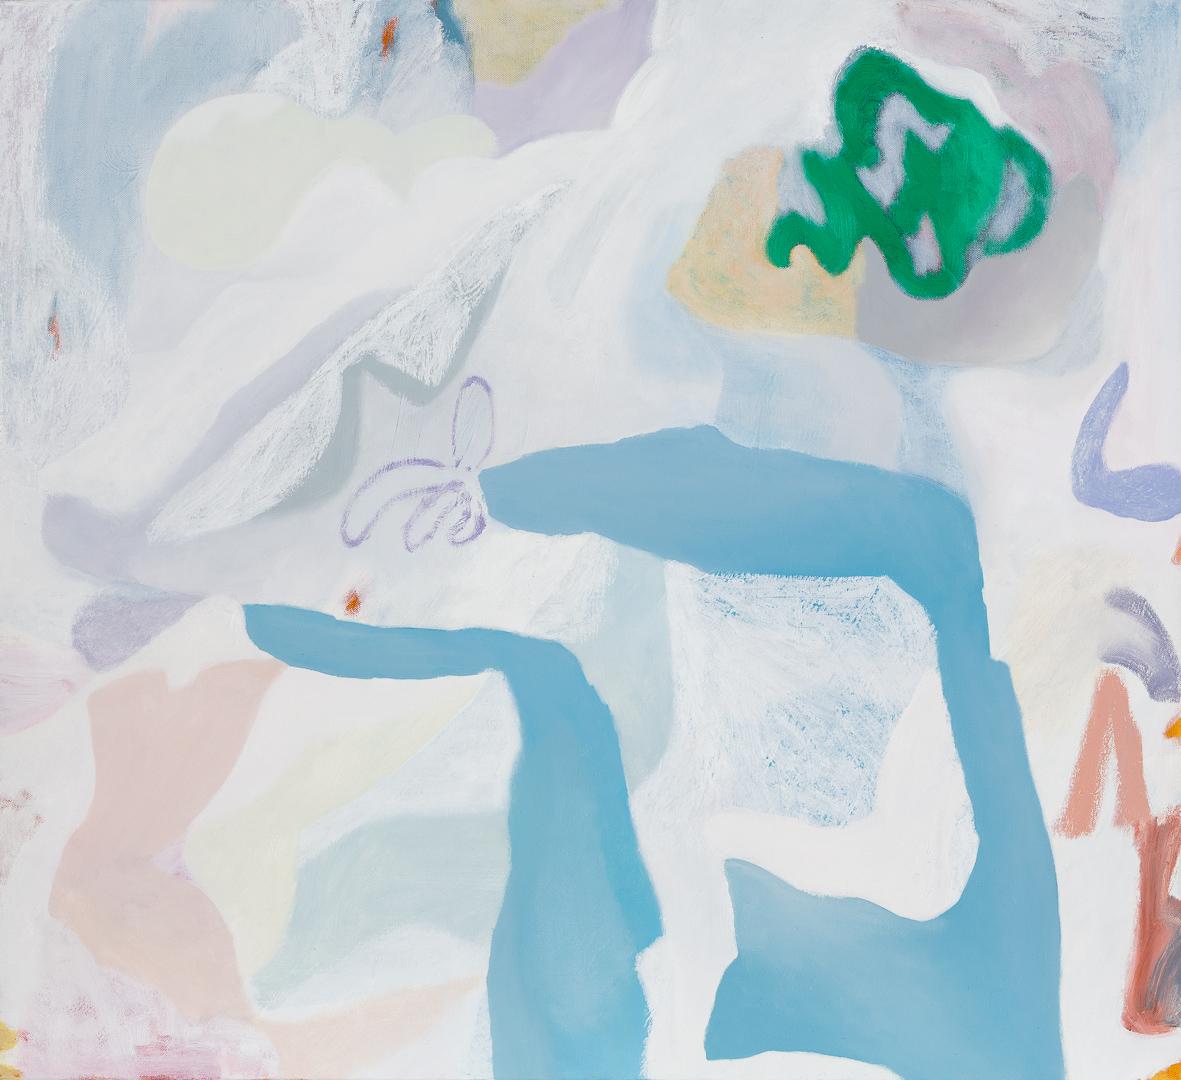 TONEE MESSIAH  White Noise Shuffle  2018 Oil on linen  76 x 84 cm